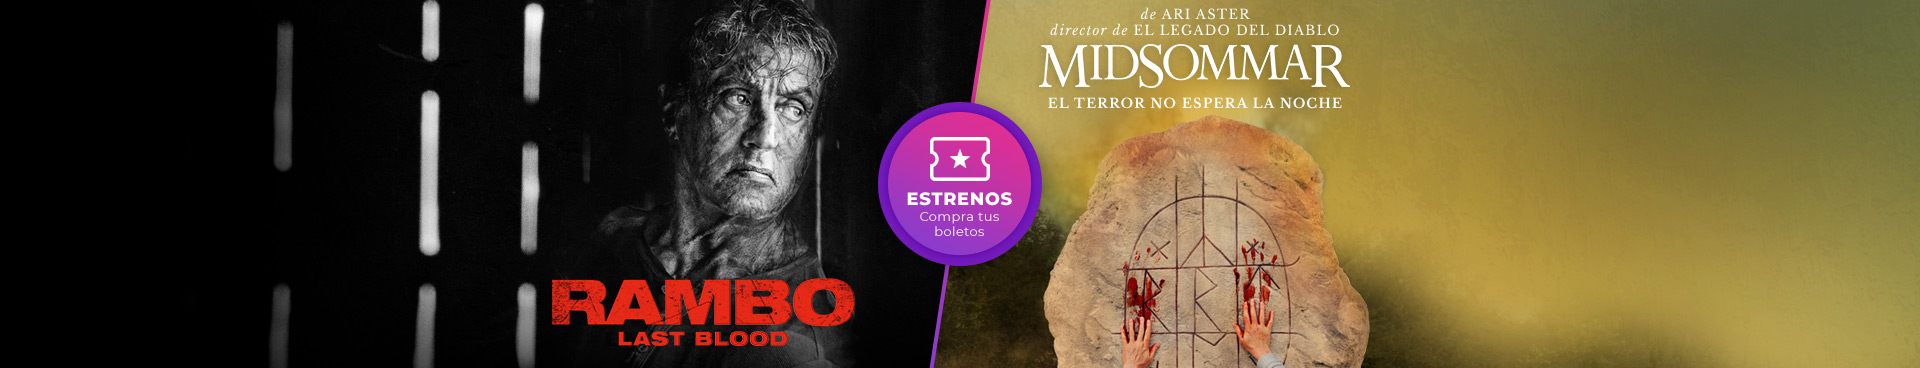 Estrenos: Rambo / Midsomar